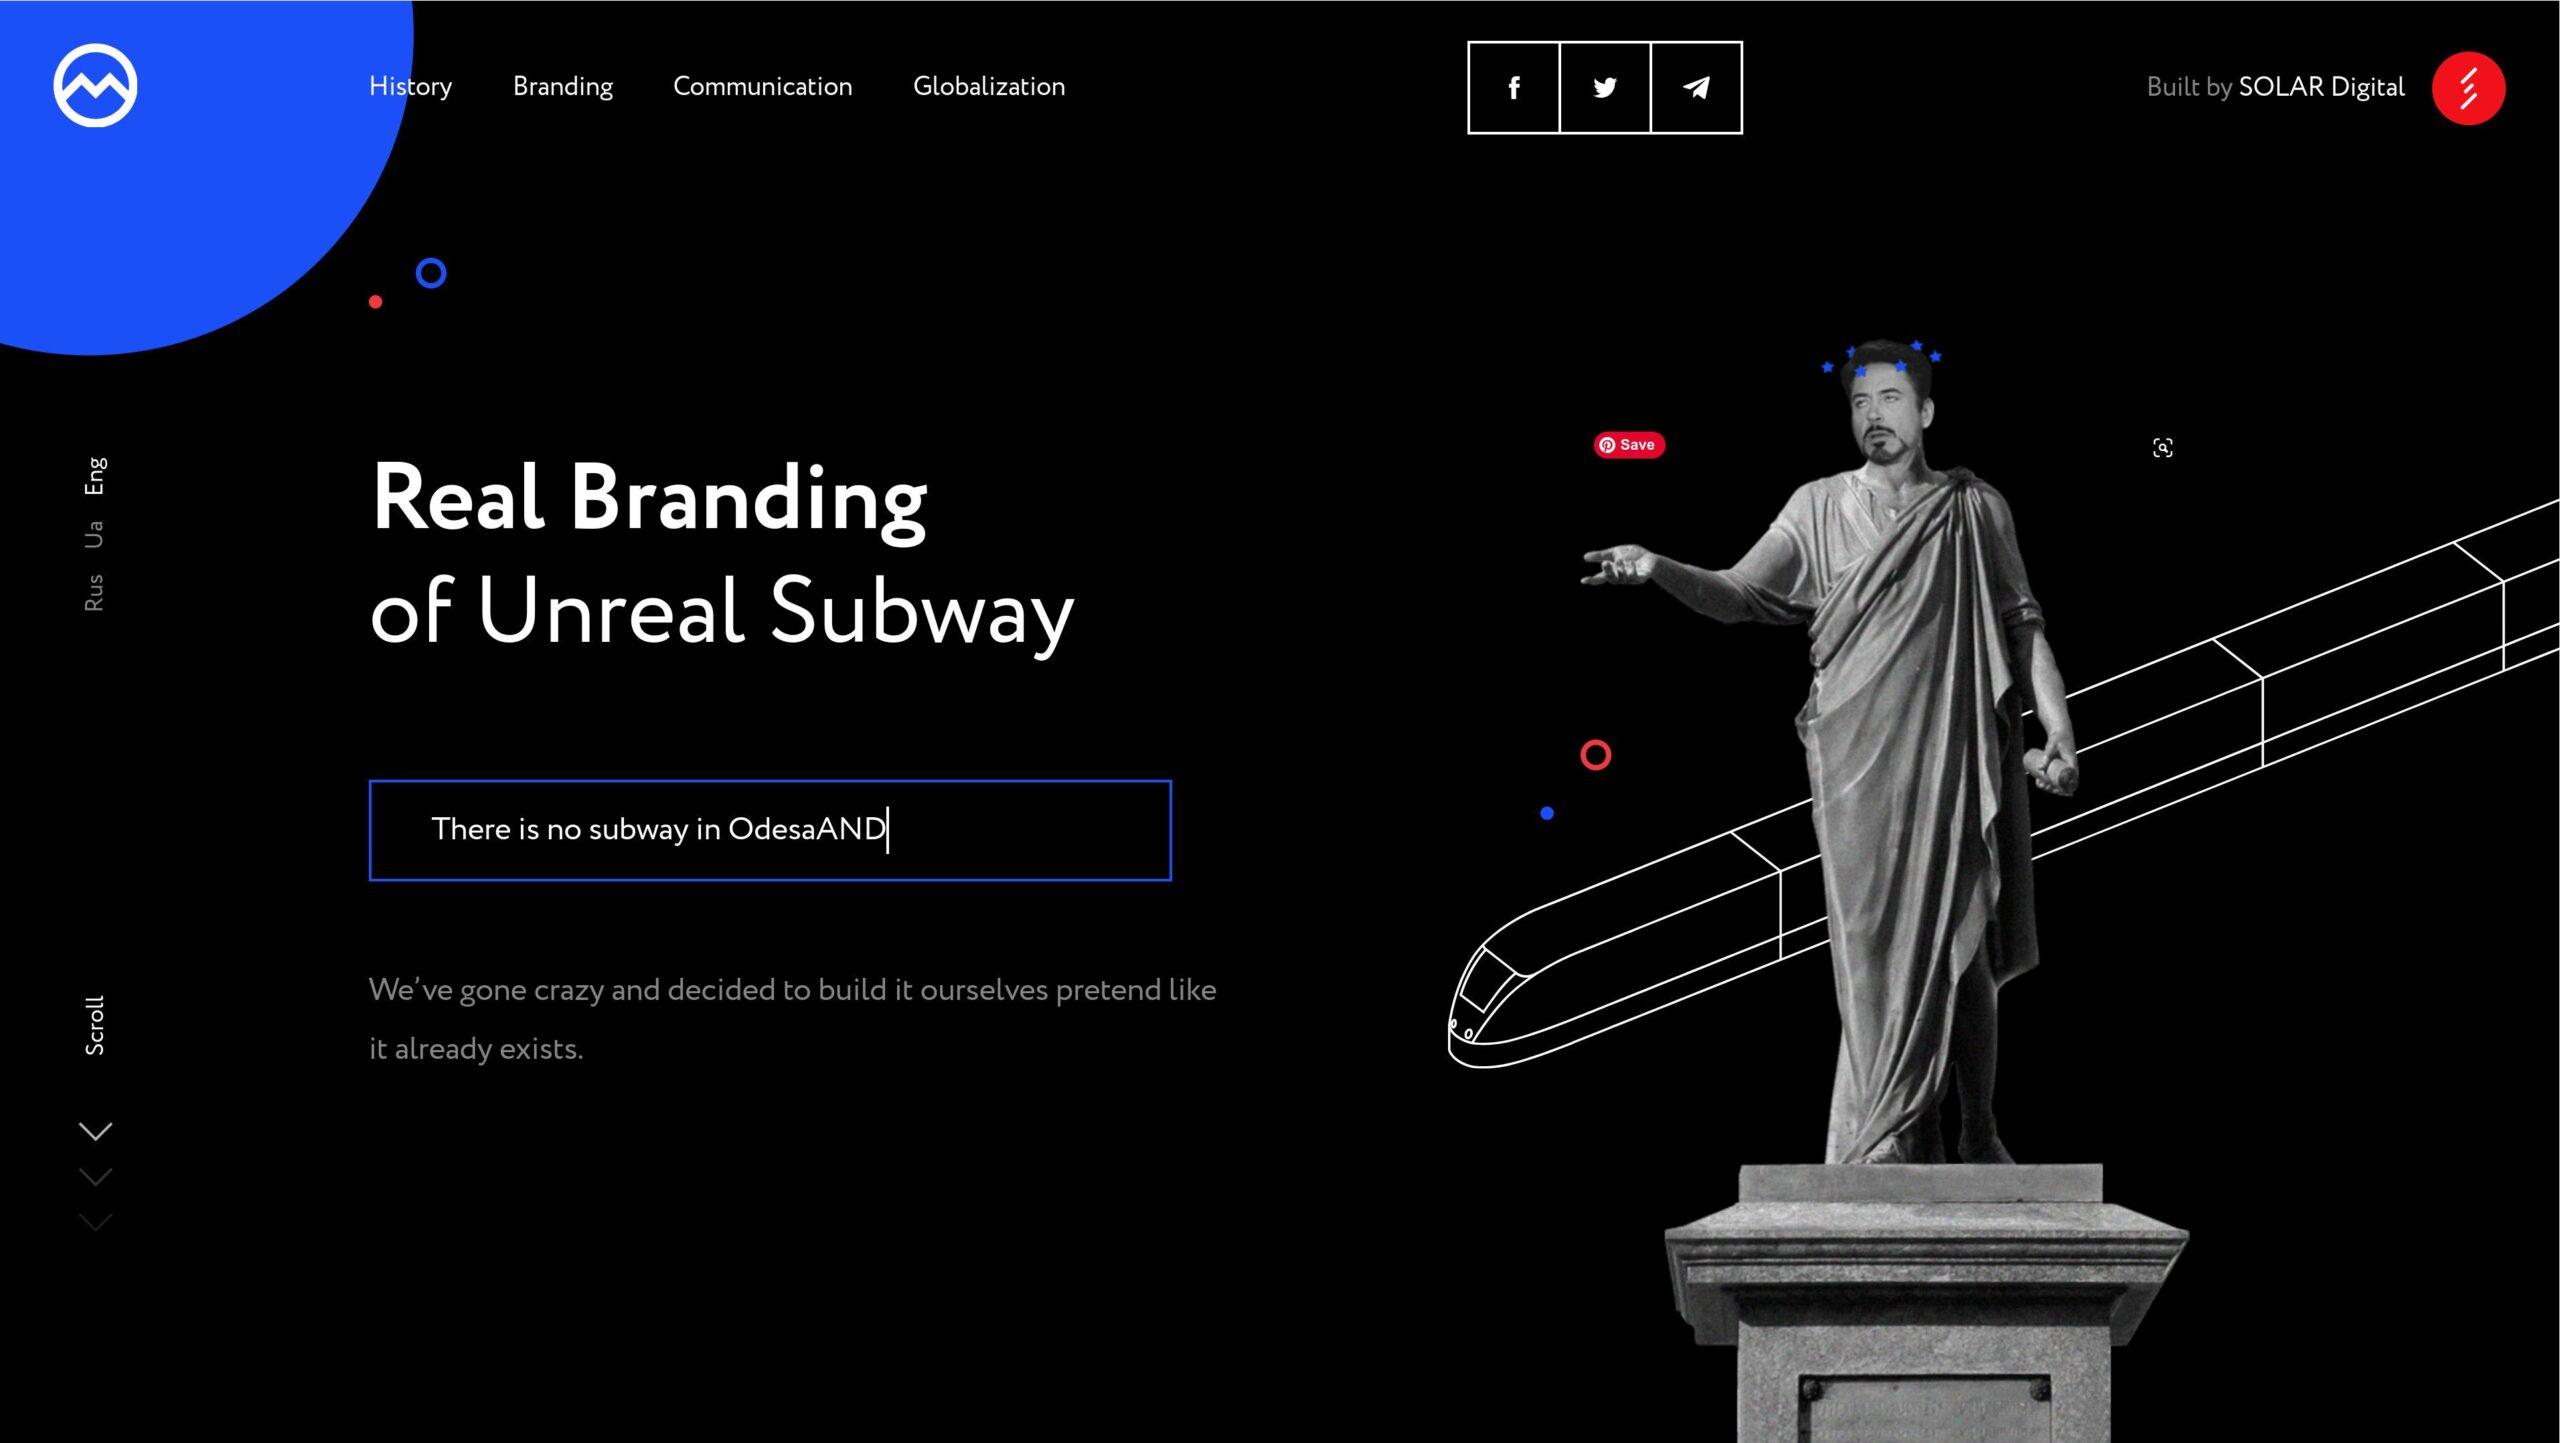 Orpetron Web Design Awards - Odessa Subway - Web Design Awards Inspiration Trends UI UX